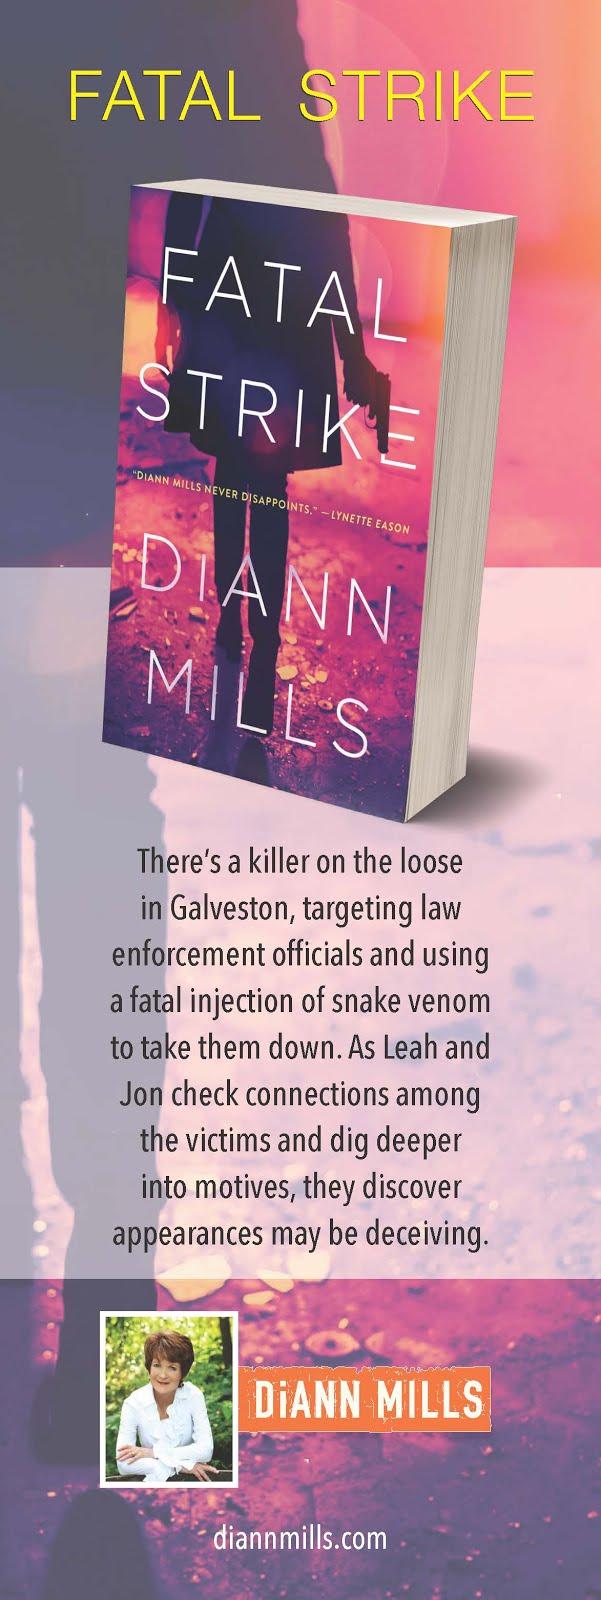 DiAnn Mills Newest Release